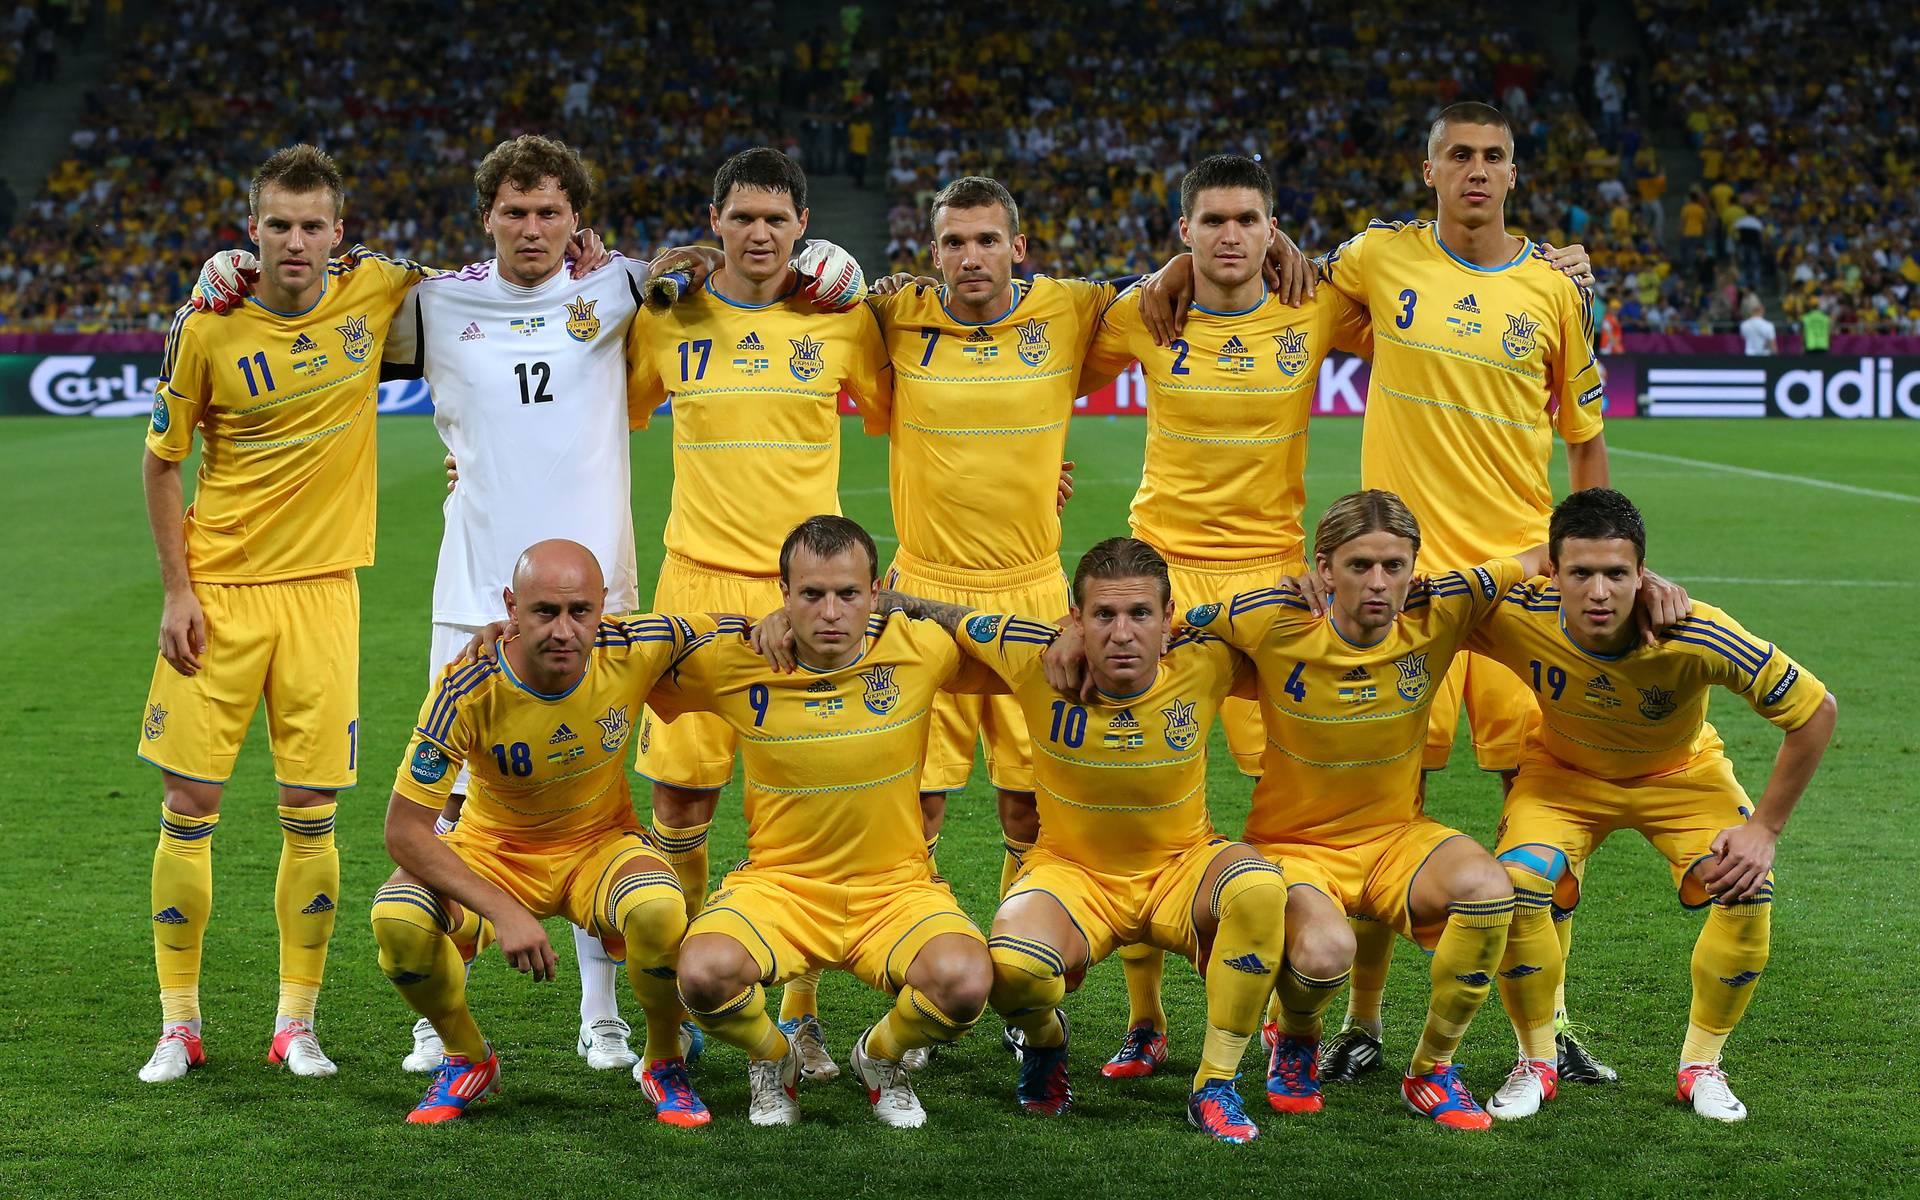 Sports Ukraine National Football Team Wallpaper 1920x1200 px Free ...